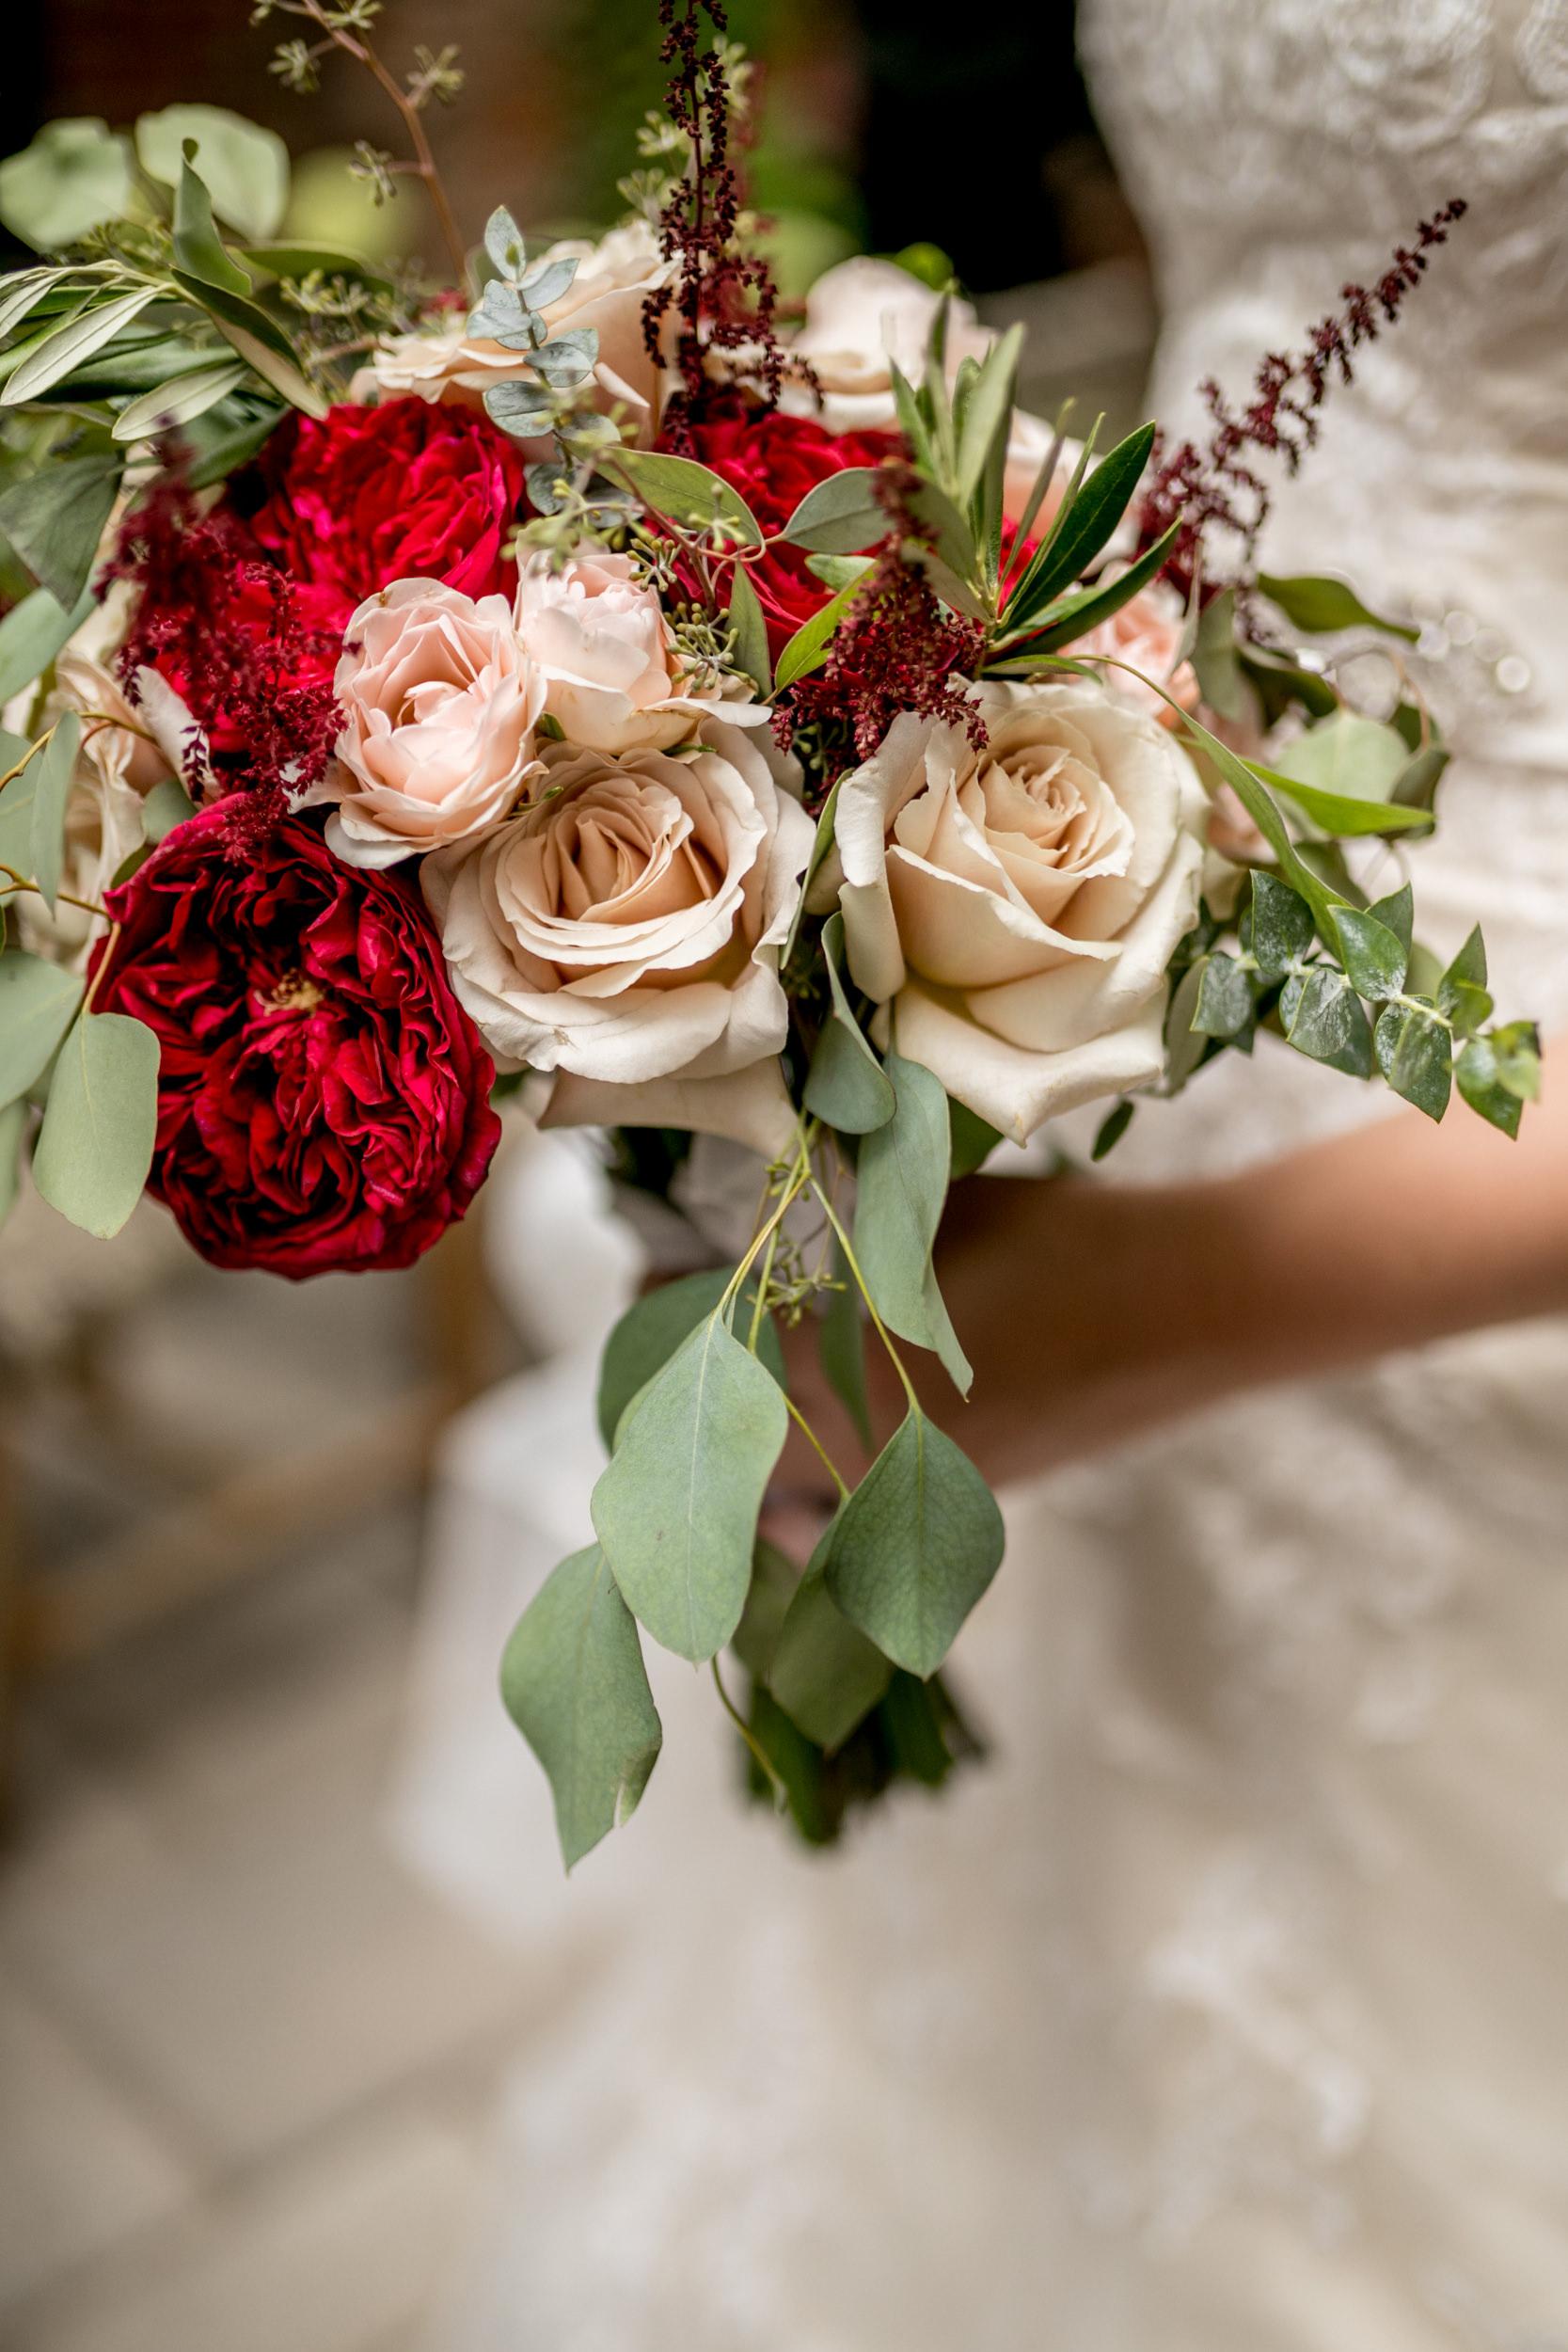 TheSmythCollective-Best-Cincinnati-Wedding-Photographer-018.jpg